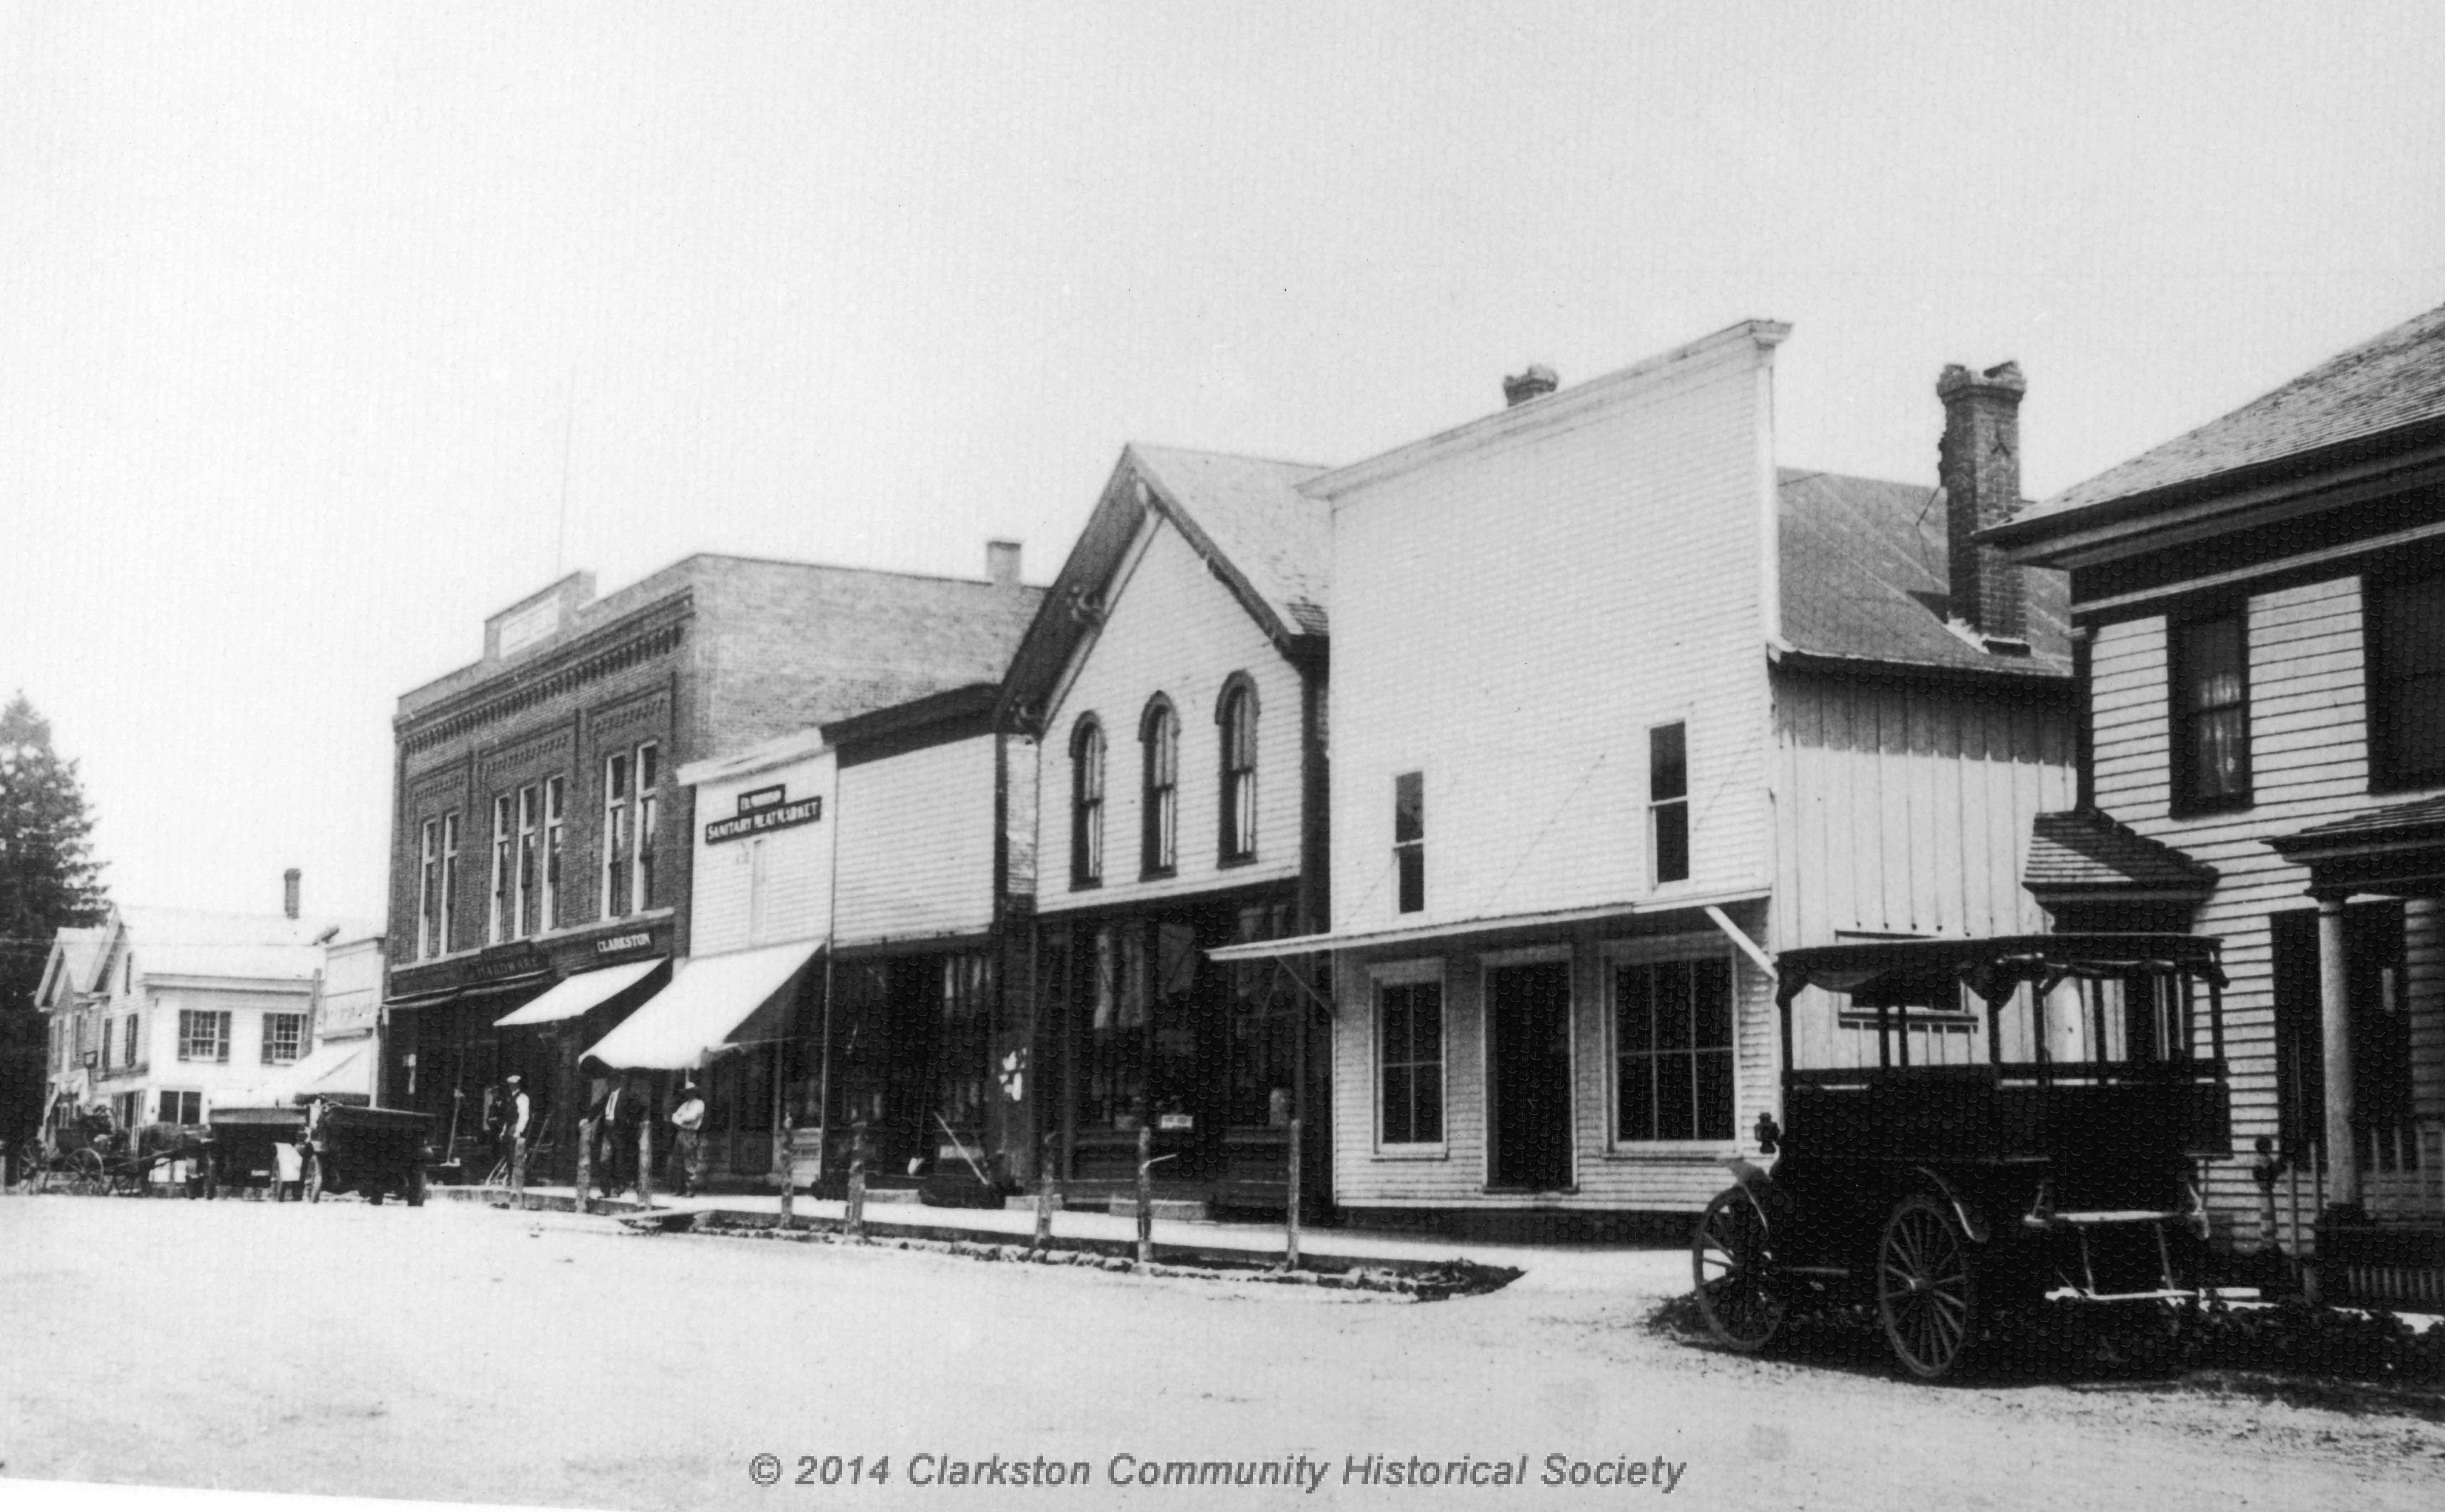 East Side of South Main Street, c. 1910